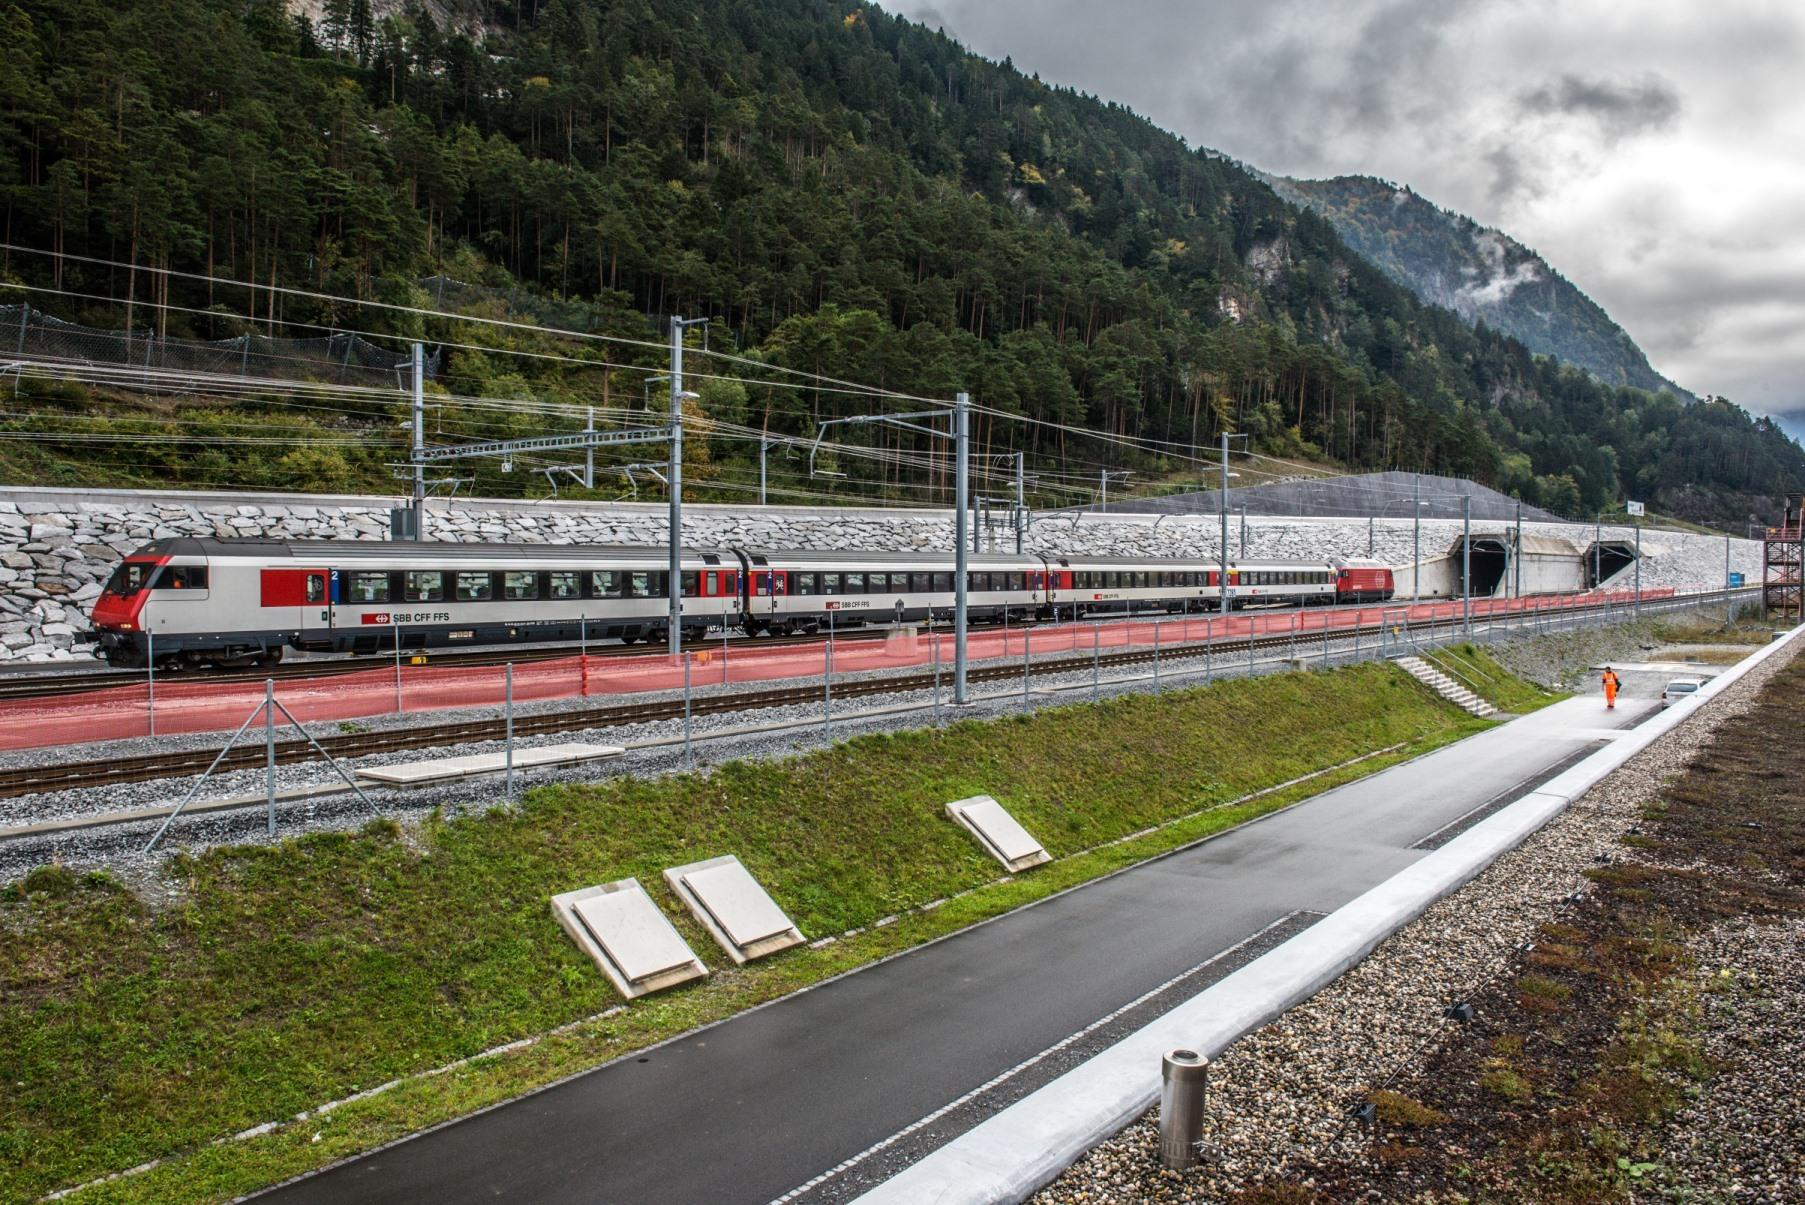 Inbetriebsetzung Nordportal Gotthard-Basistunnel, Erstfeld, Zentralschweiz / Commissioning Nordportal Gotthard Base Tunnel, Central Switzerland